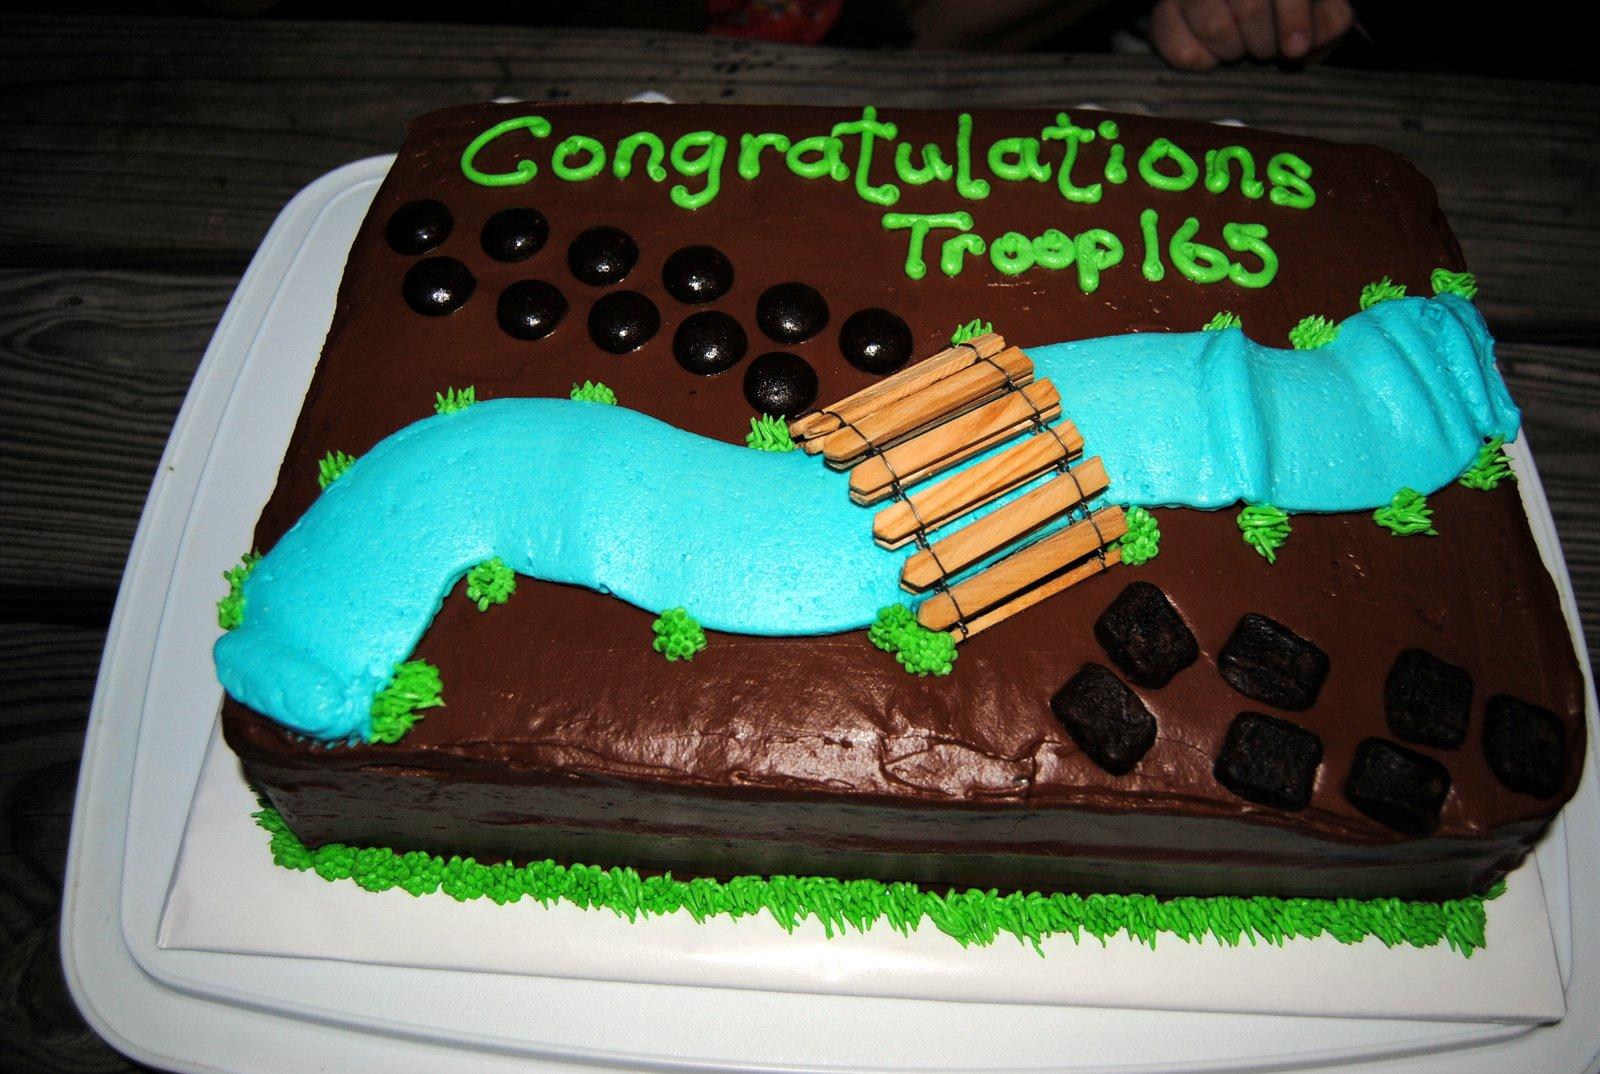 Late Night Cakes: Girl Scout Bridge Ceremony Cake